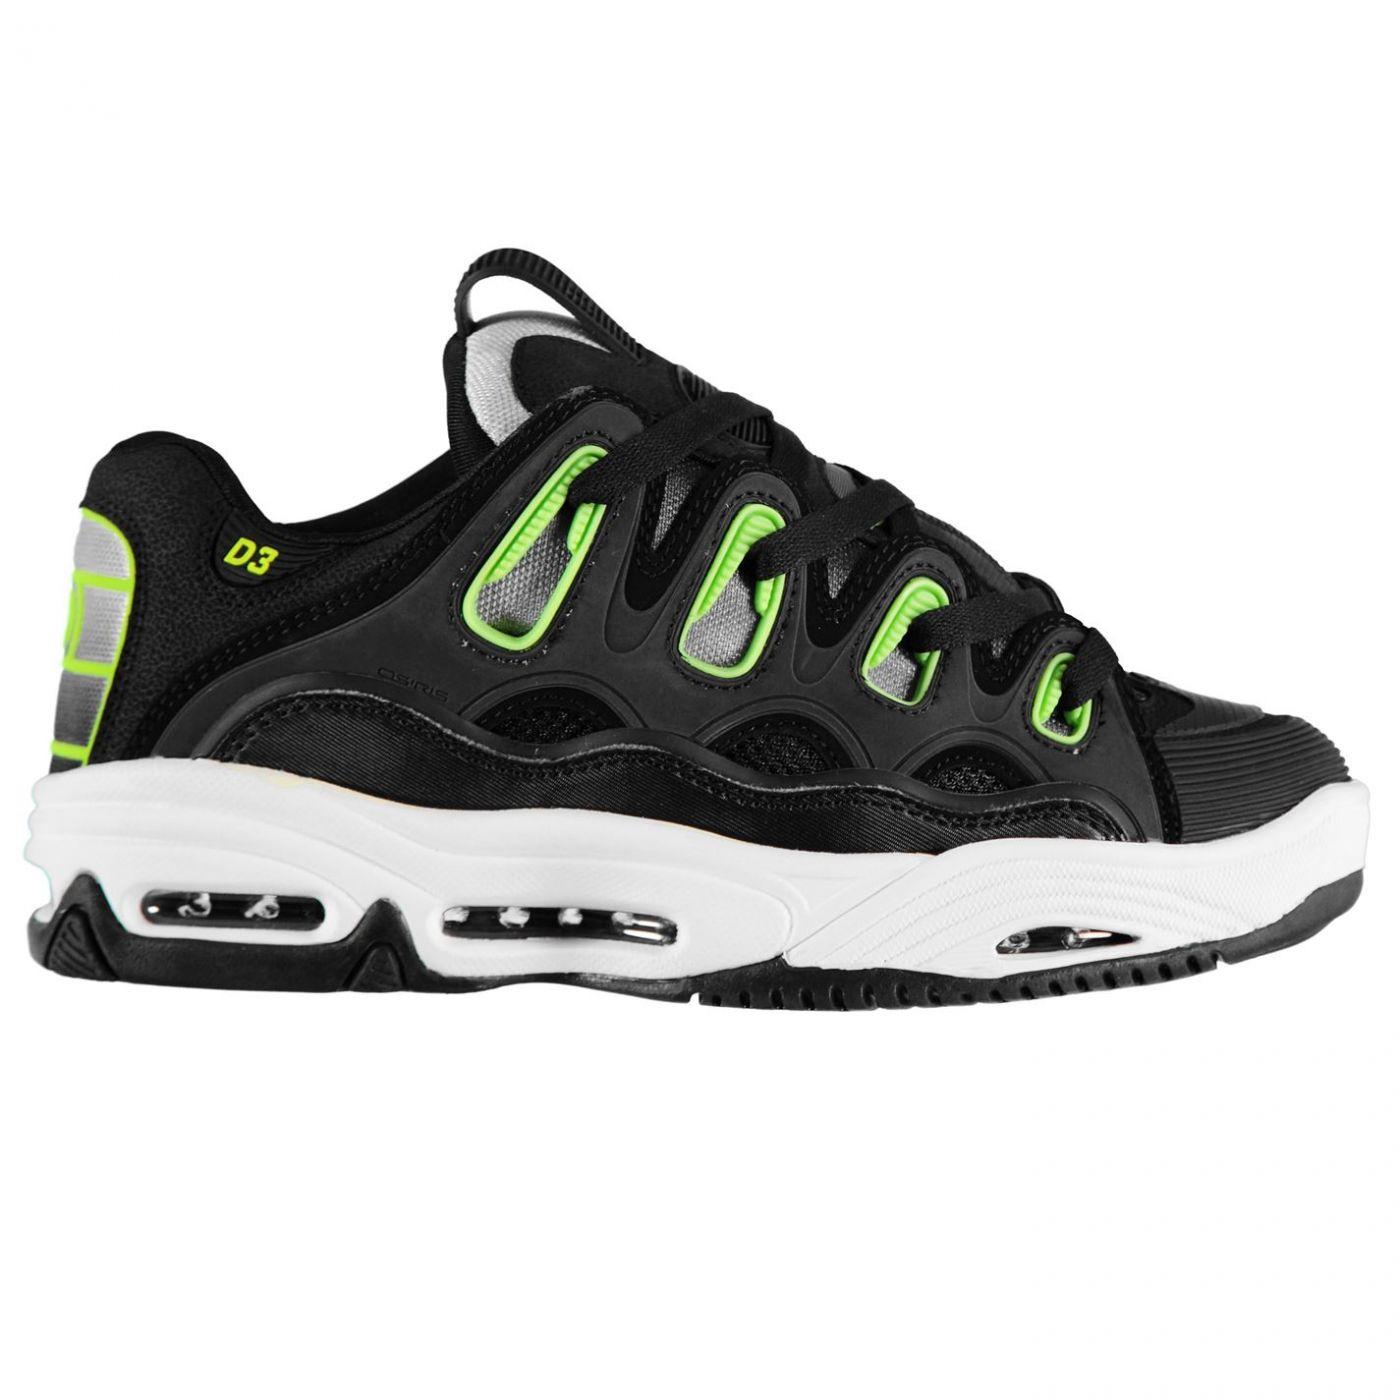 Osiris D3 2001 Mens Skate Shoes